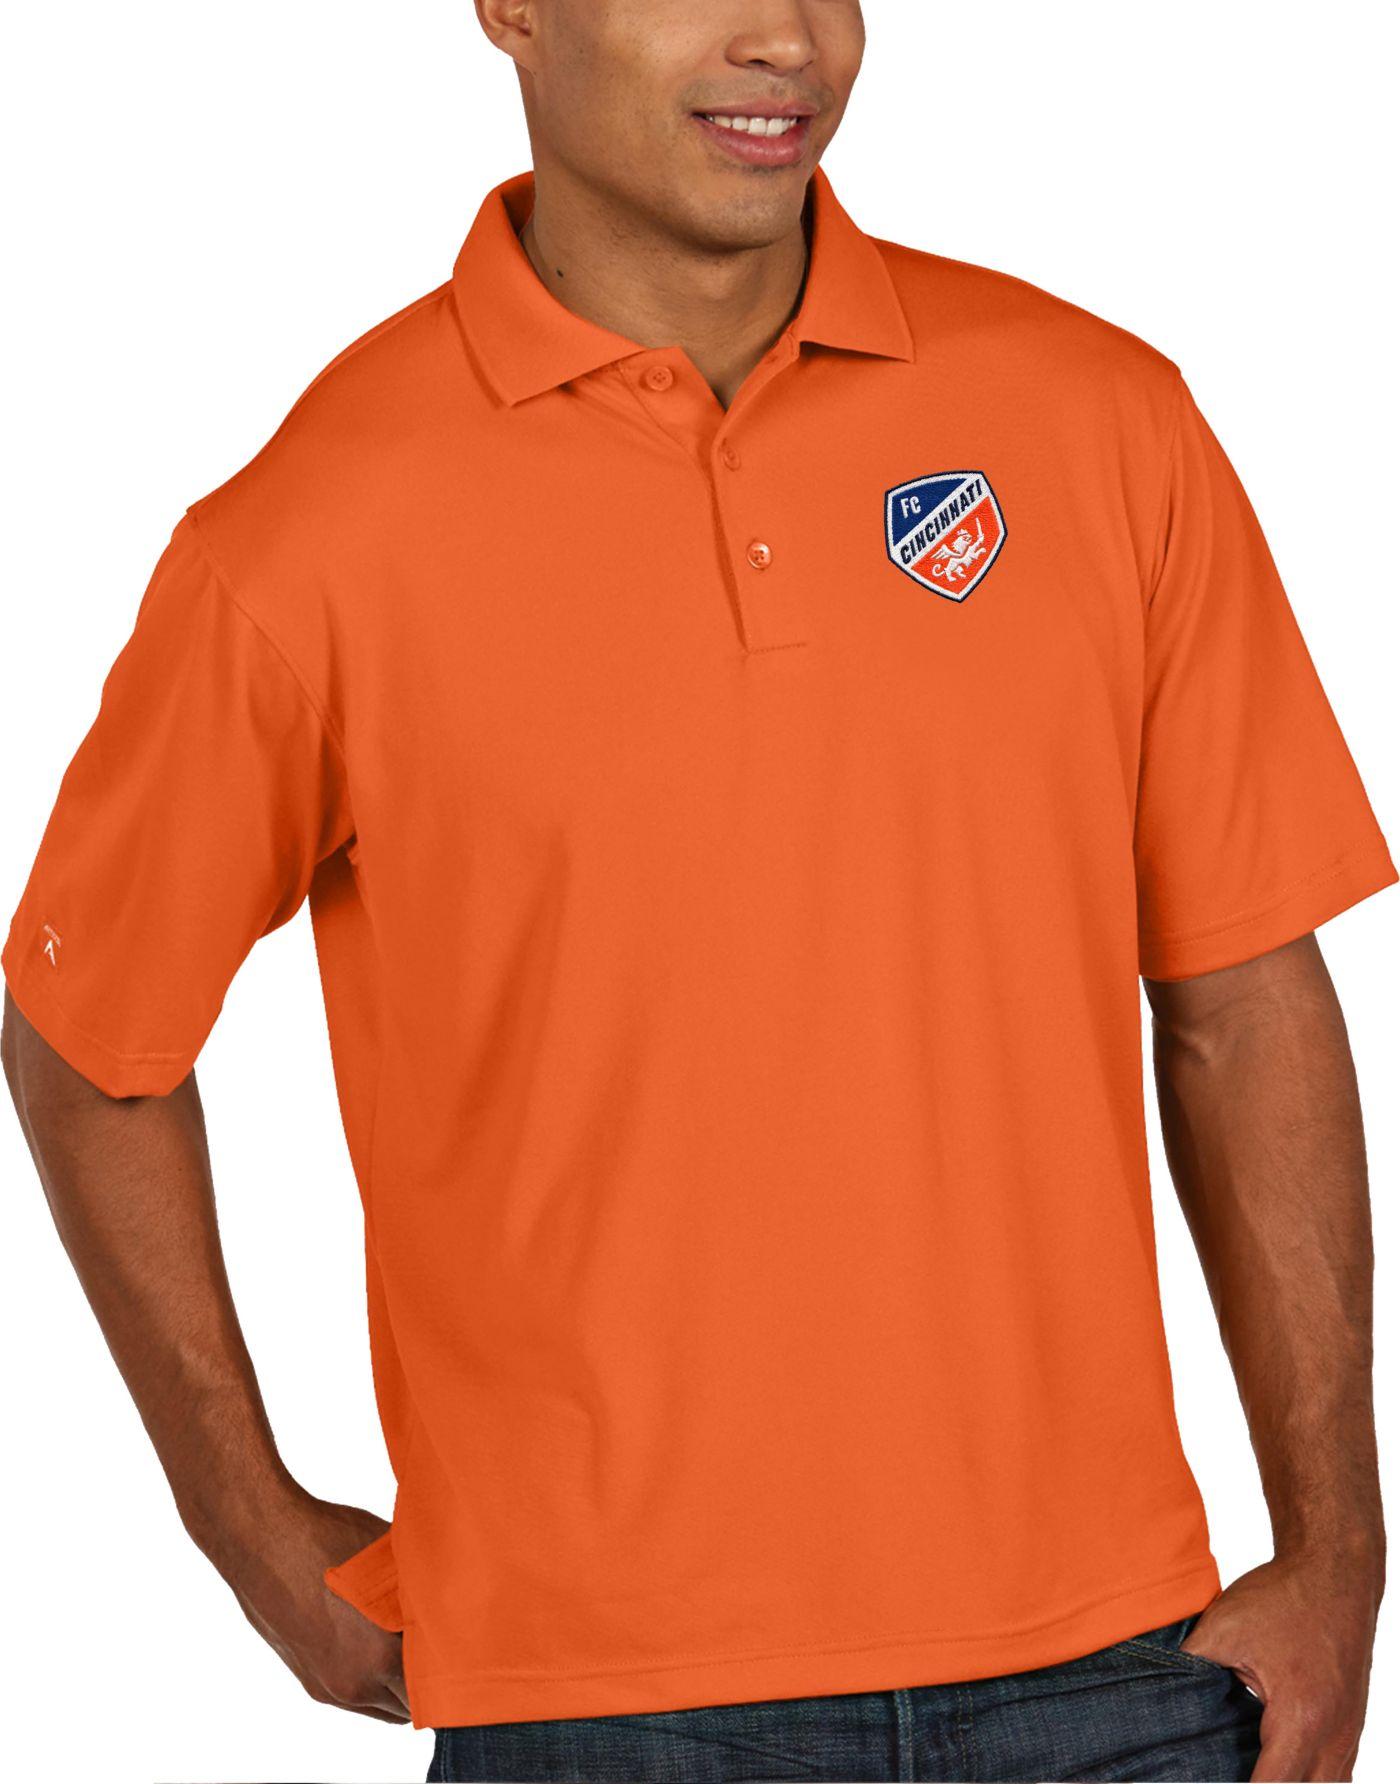 Antigua Men's FC Cincinnati Pique Orange Polo